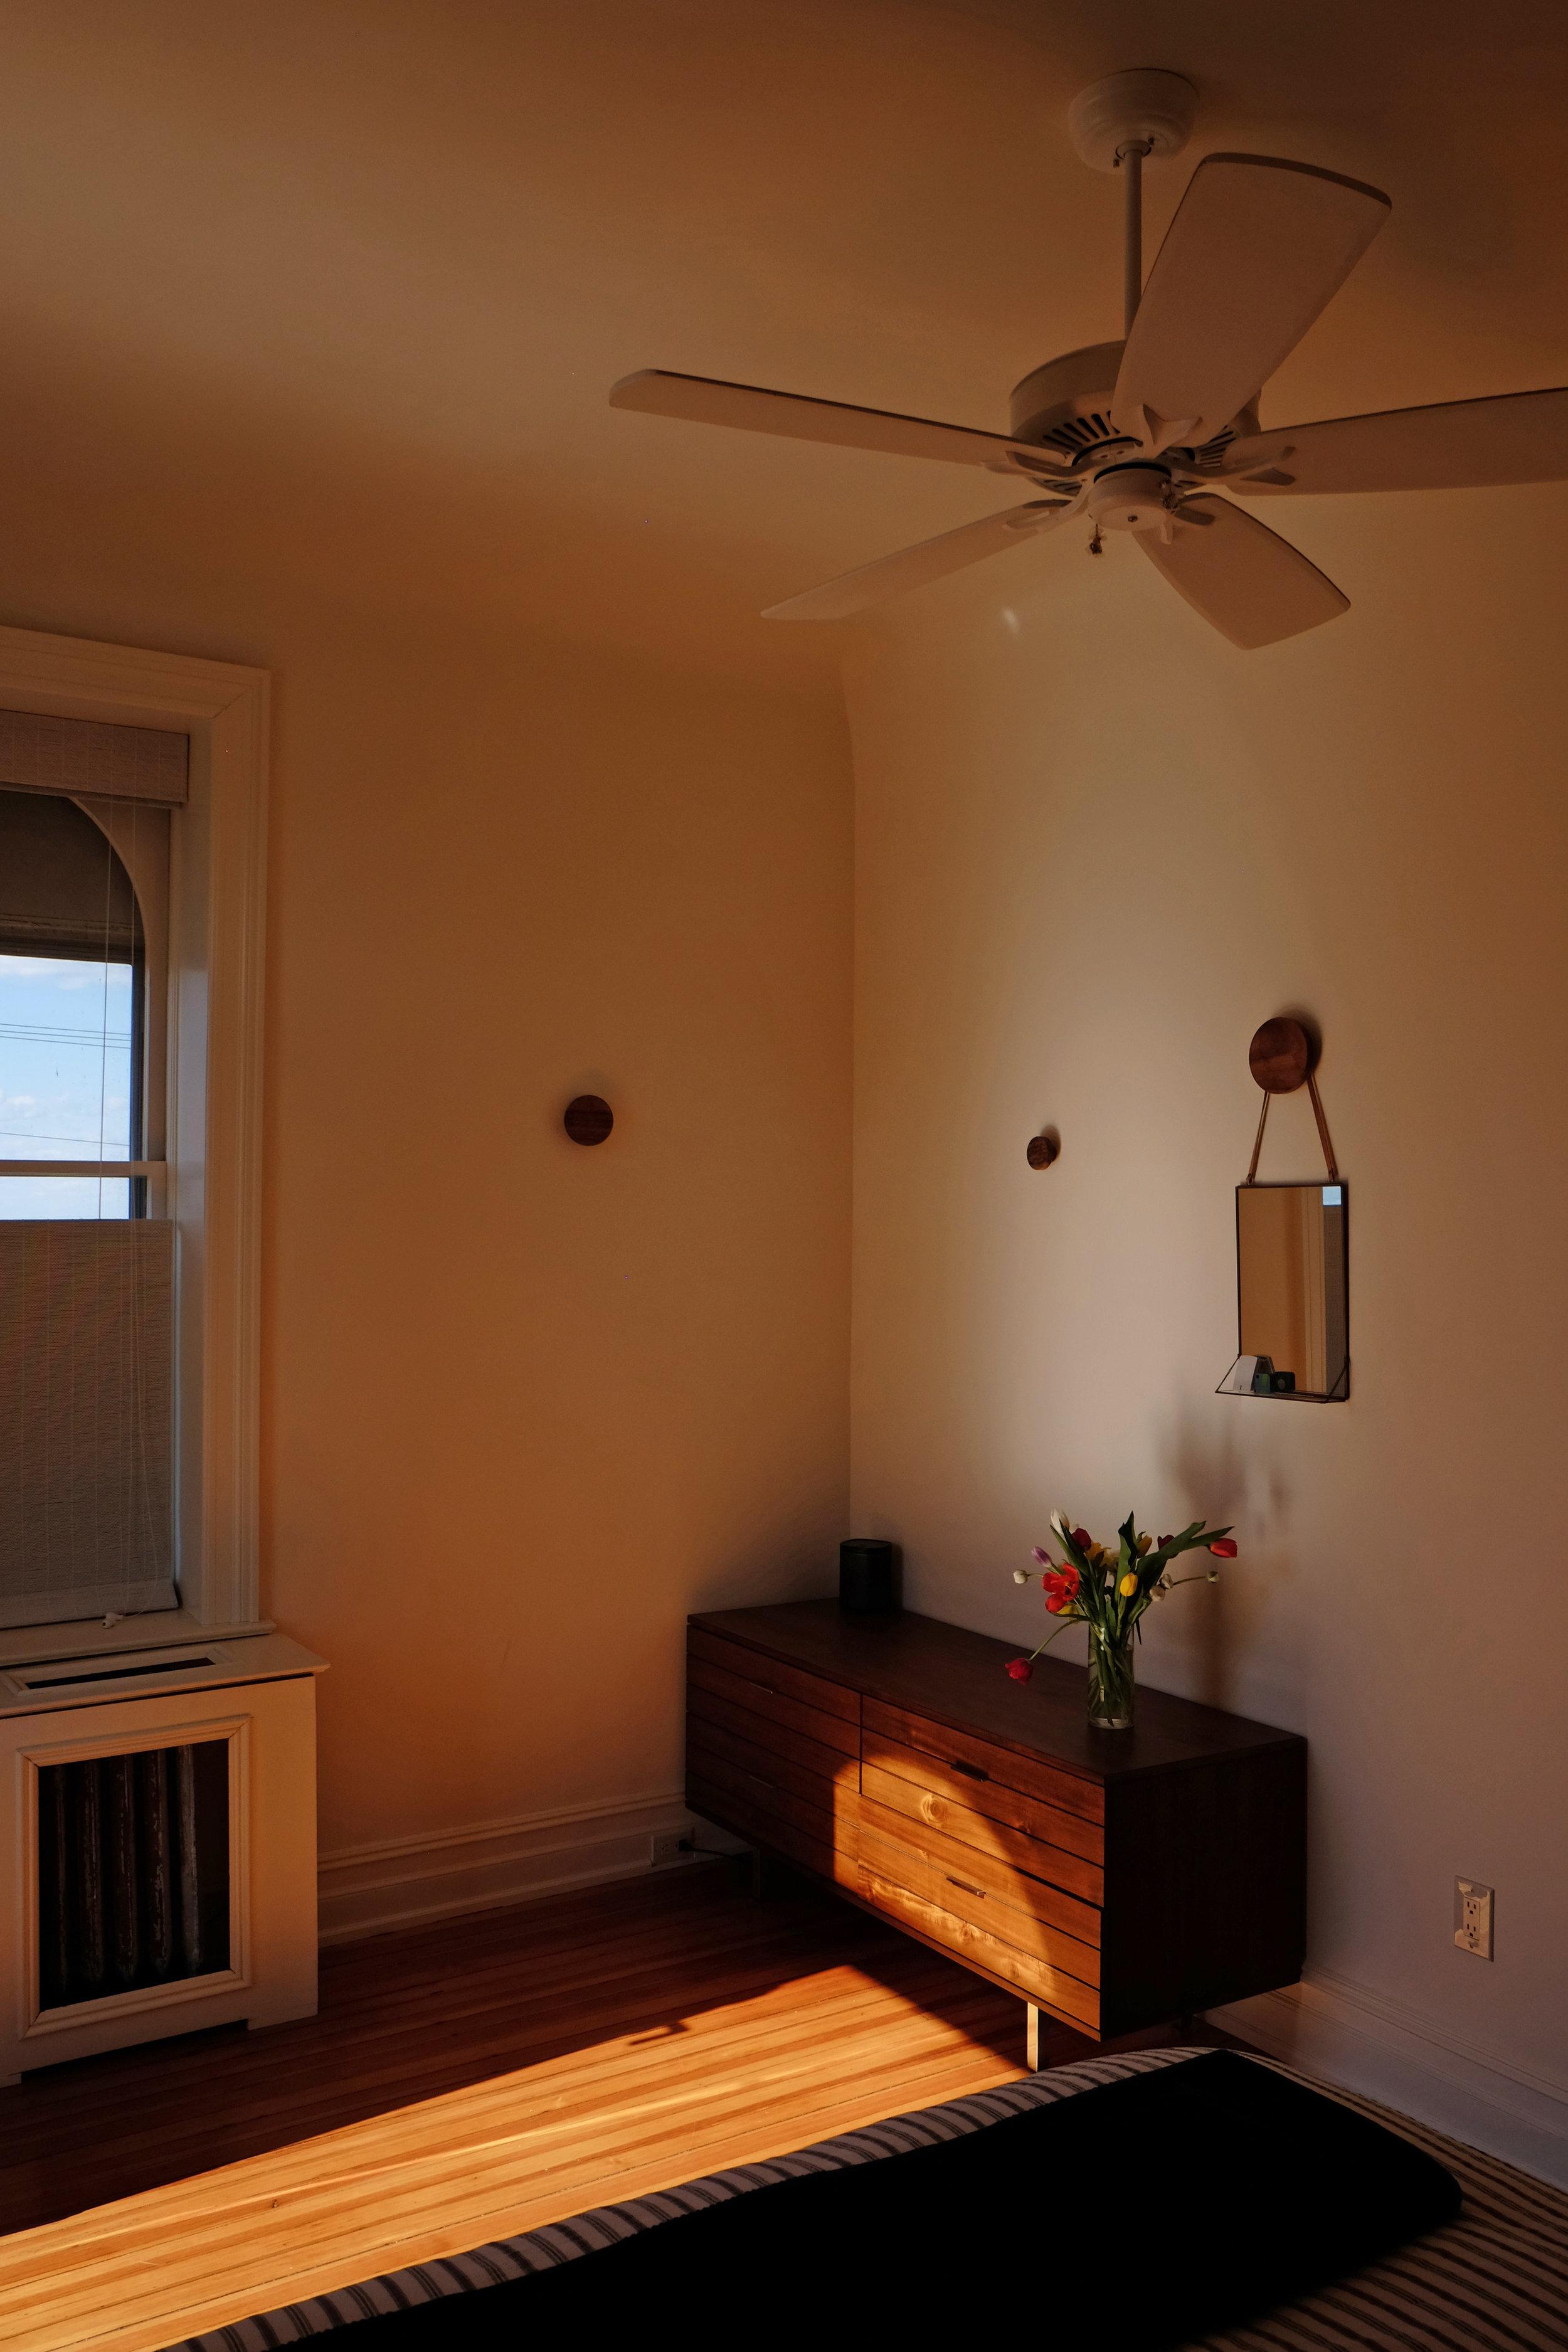 The Sunset Room, The Castle, Rockaway